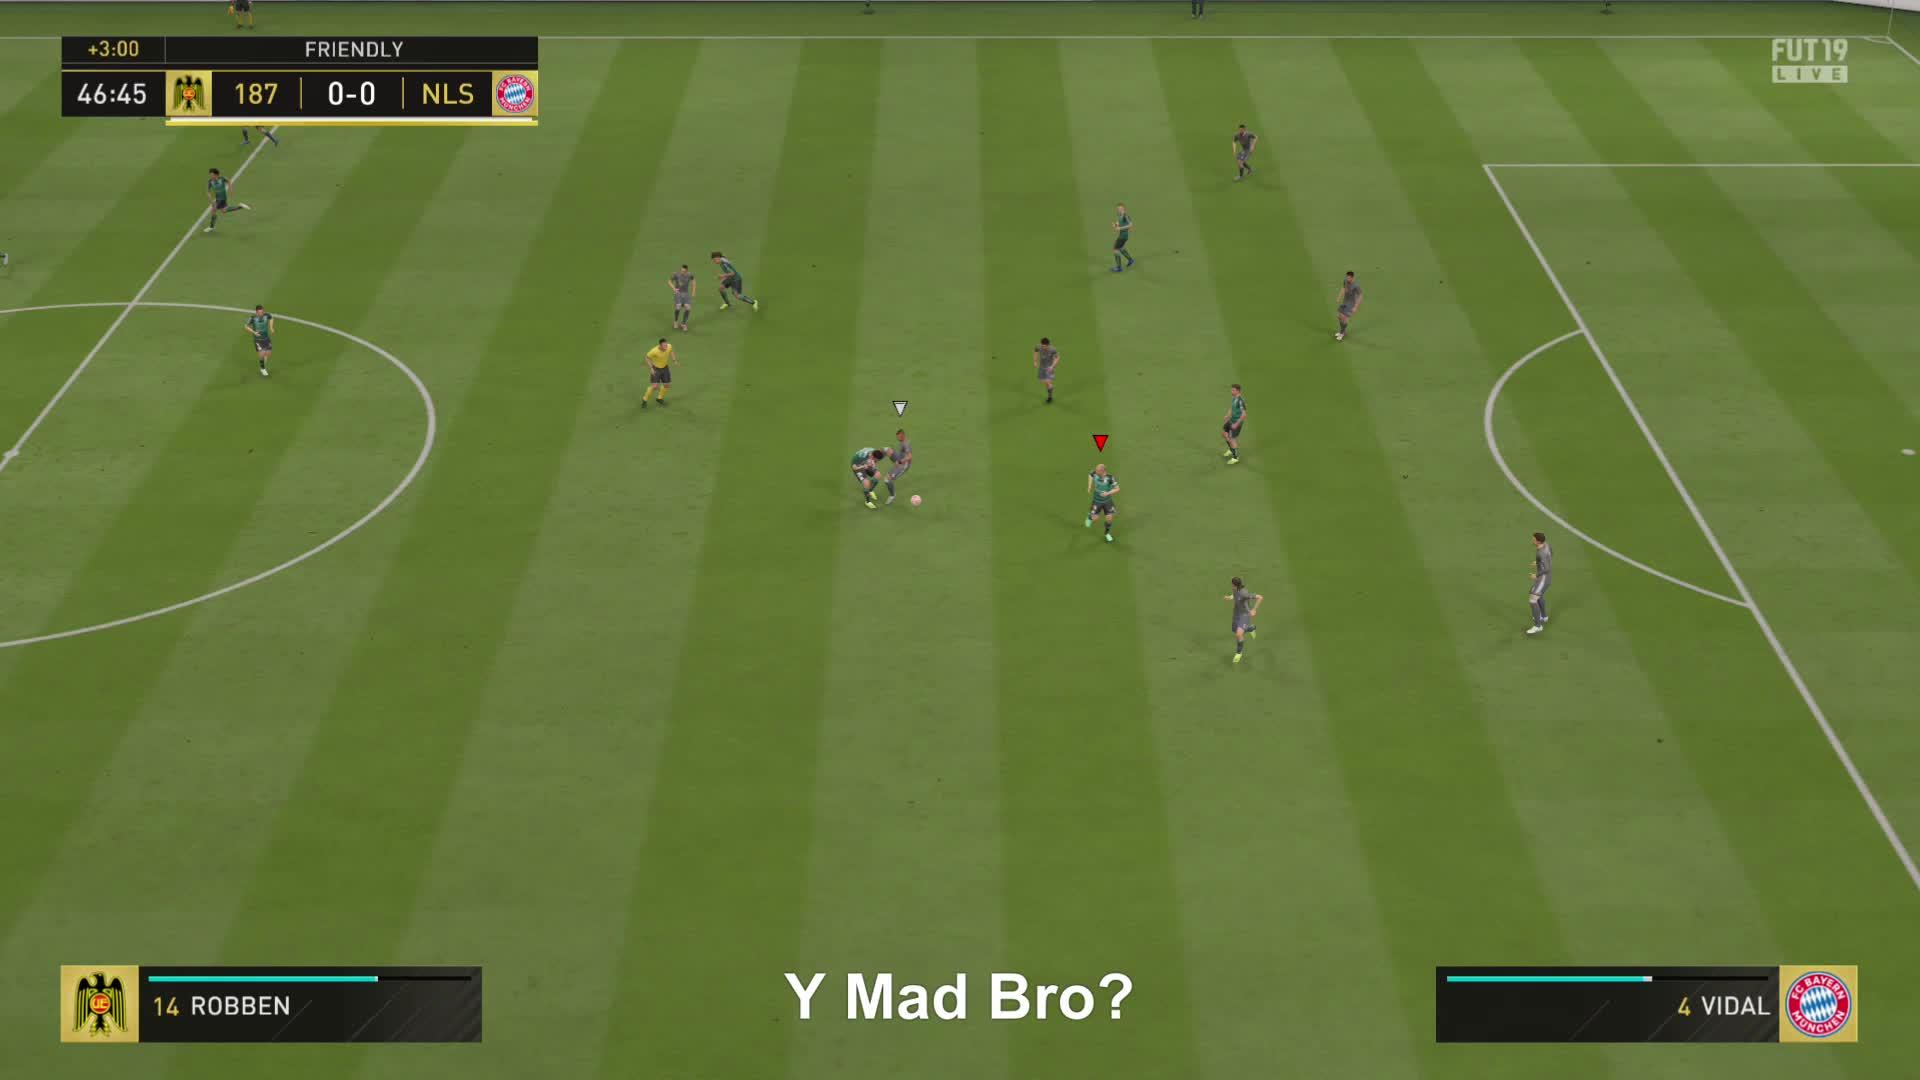 FIFA19, XSILENTX56, gamer dvr, xbox, xbox one, InYoFaceBones GIFs